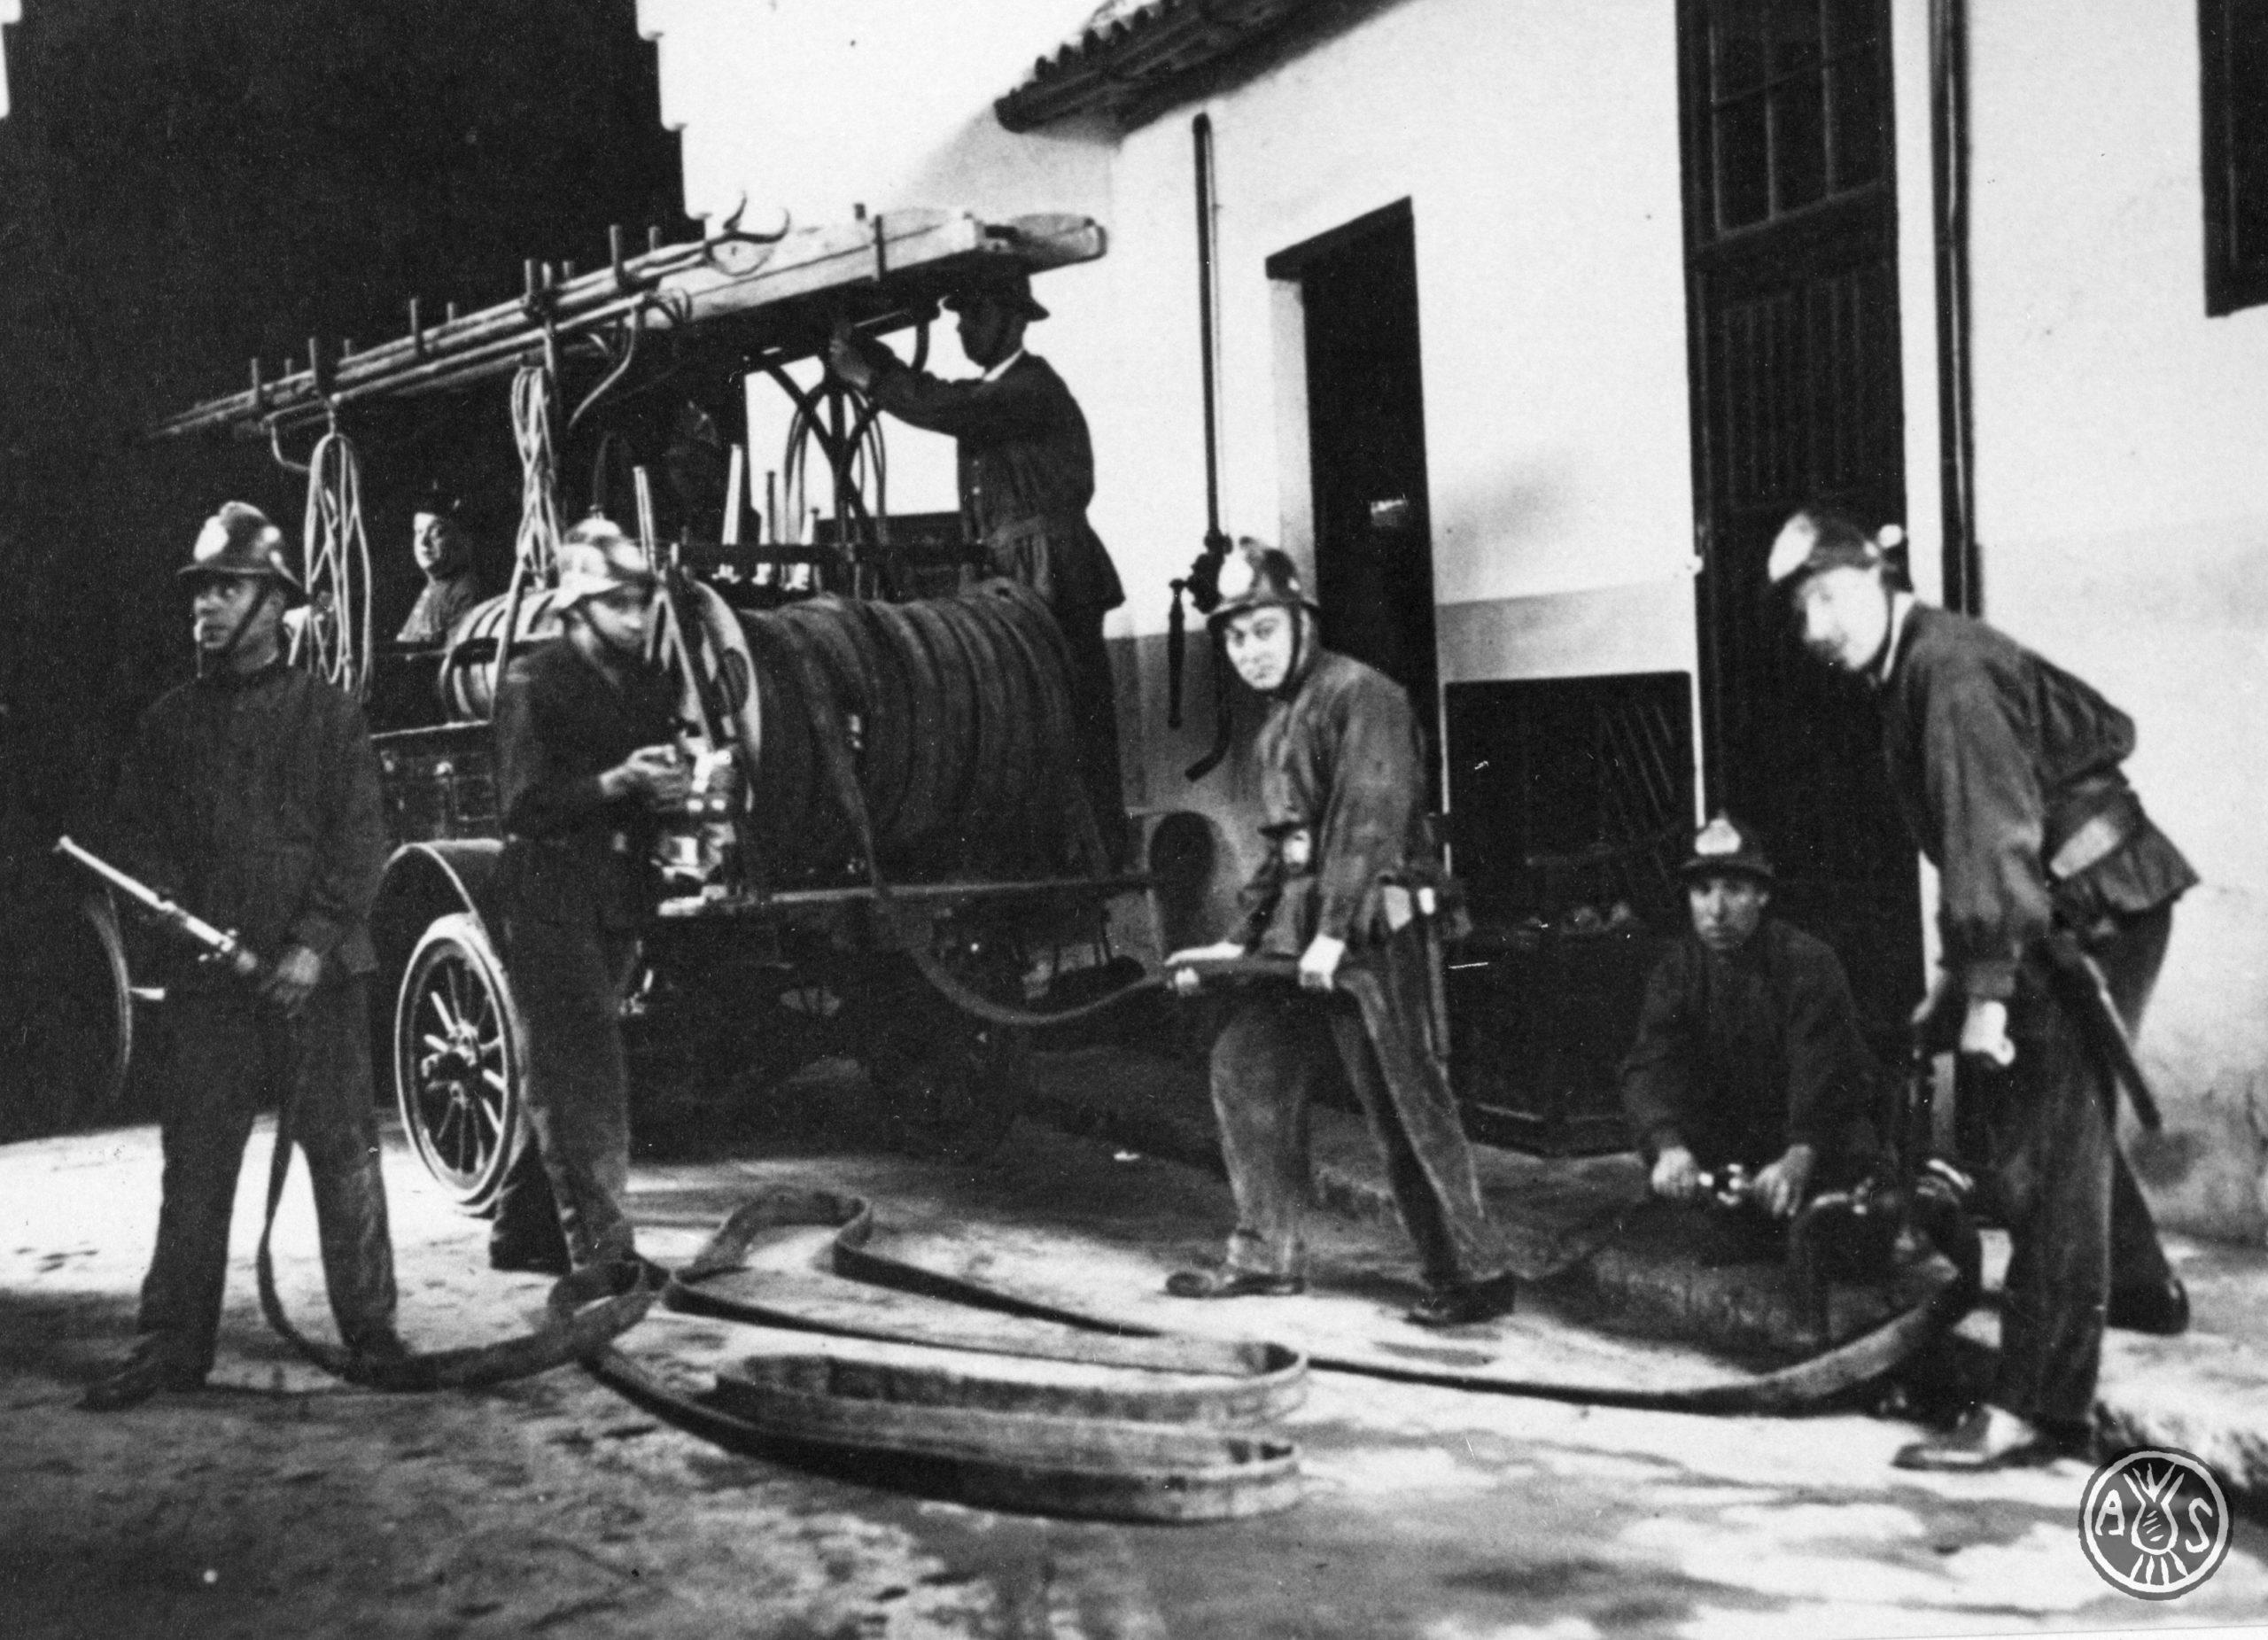 Bombers de Sabadell 1928 (aprox.)